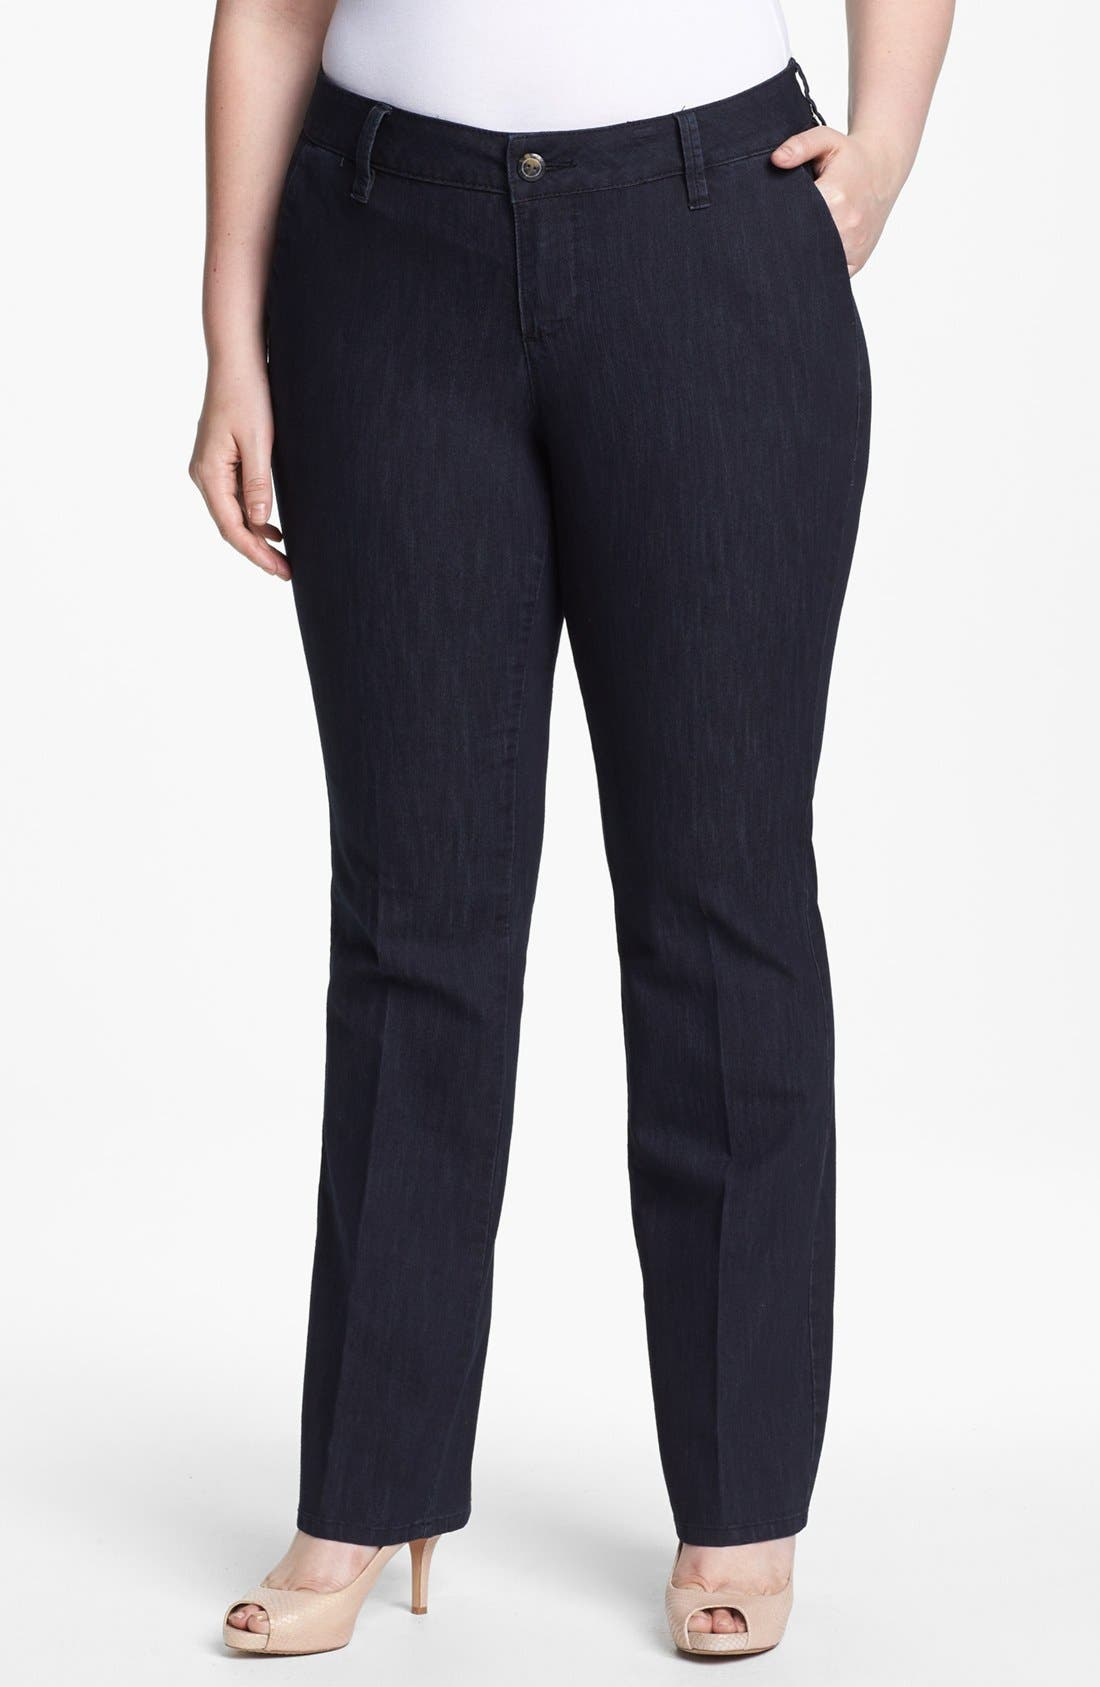 Alternate Image 1 Selected - Jag Jeans 'Elisha' Trouser Jeans (Plus Size)